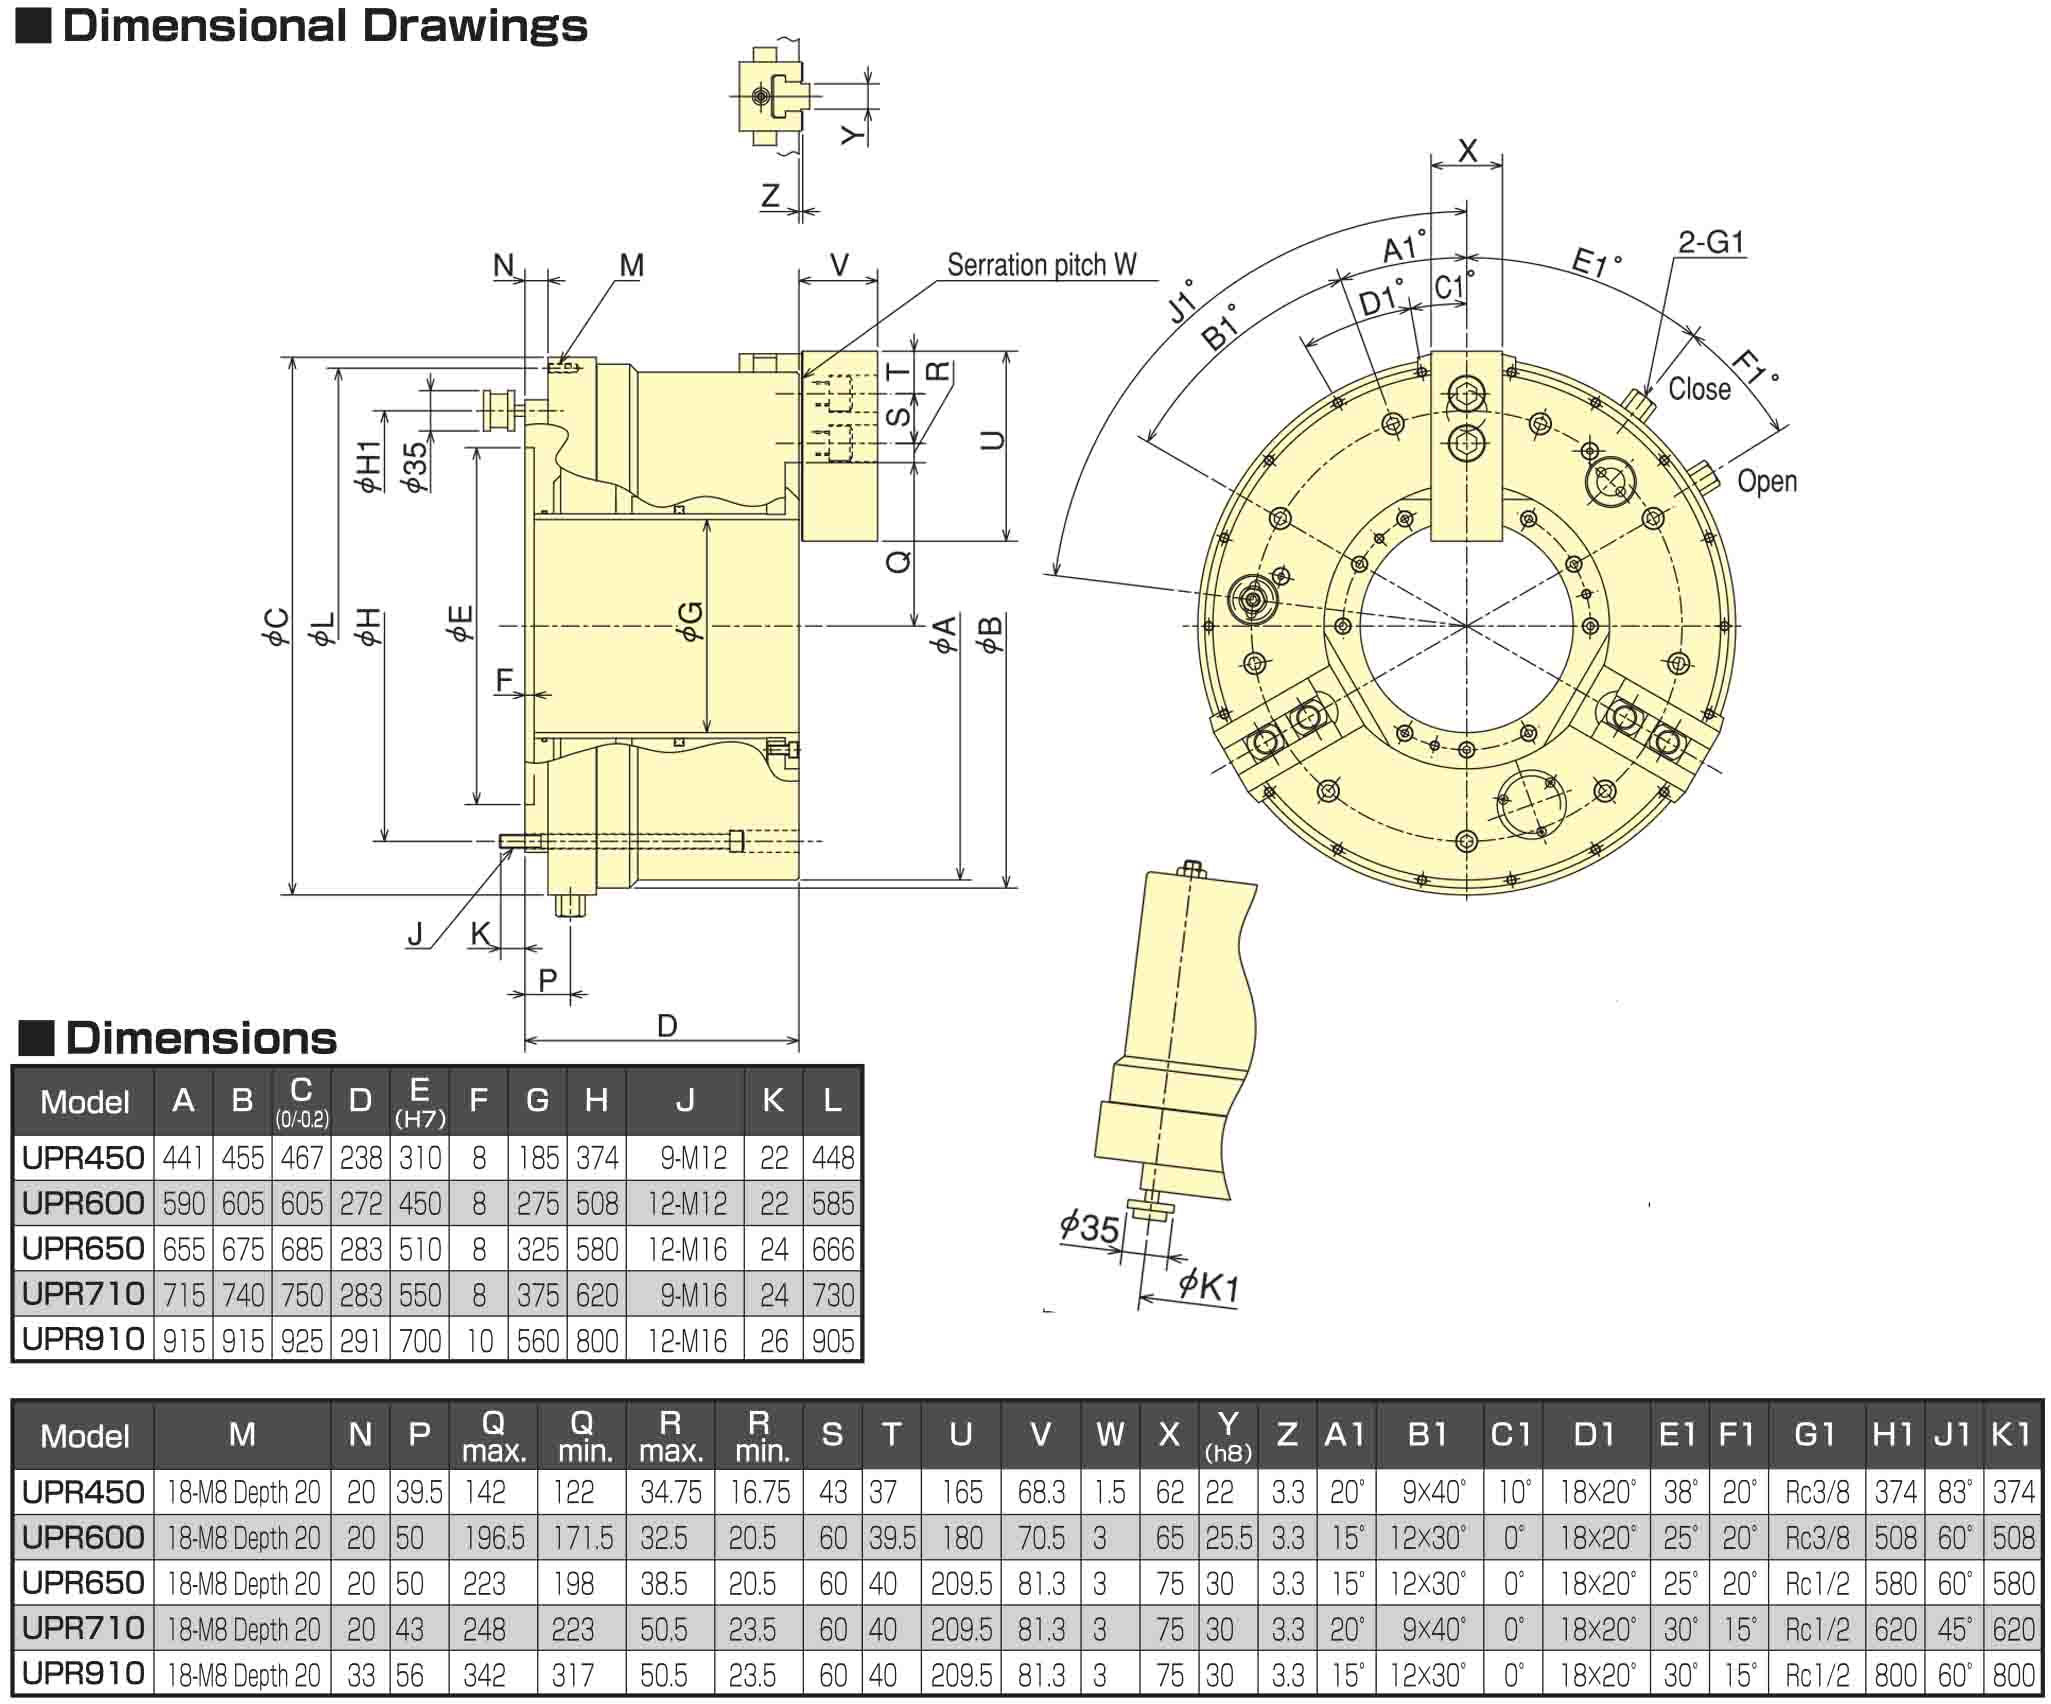 Kitagawa UPR910 Air-Operated Chuck Dimensional Drawings